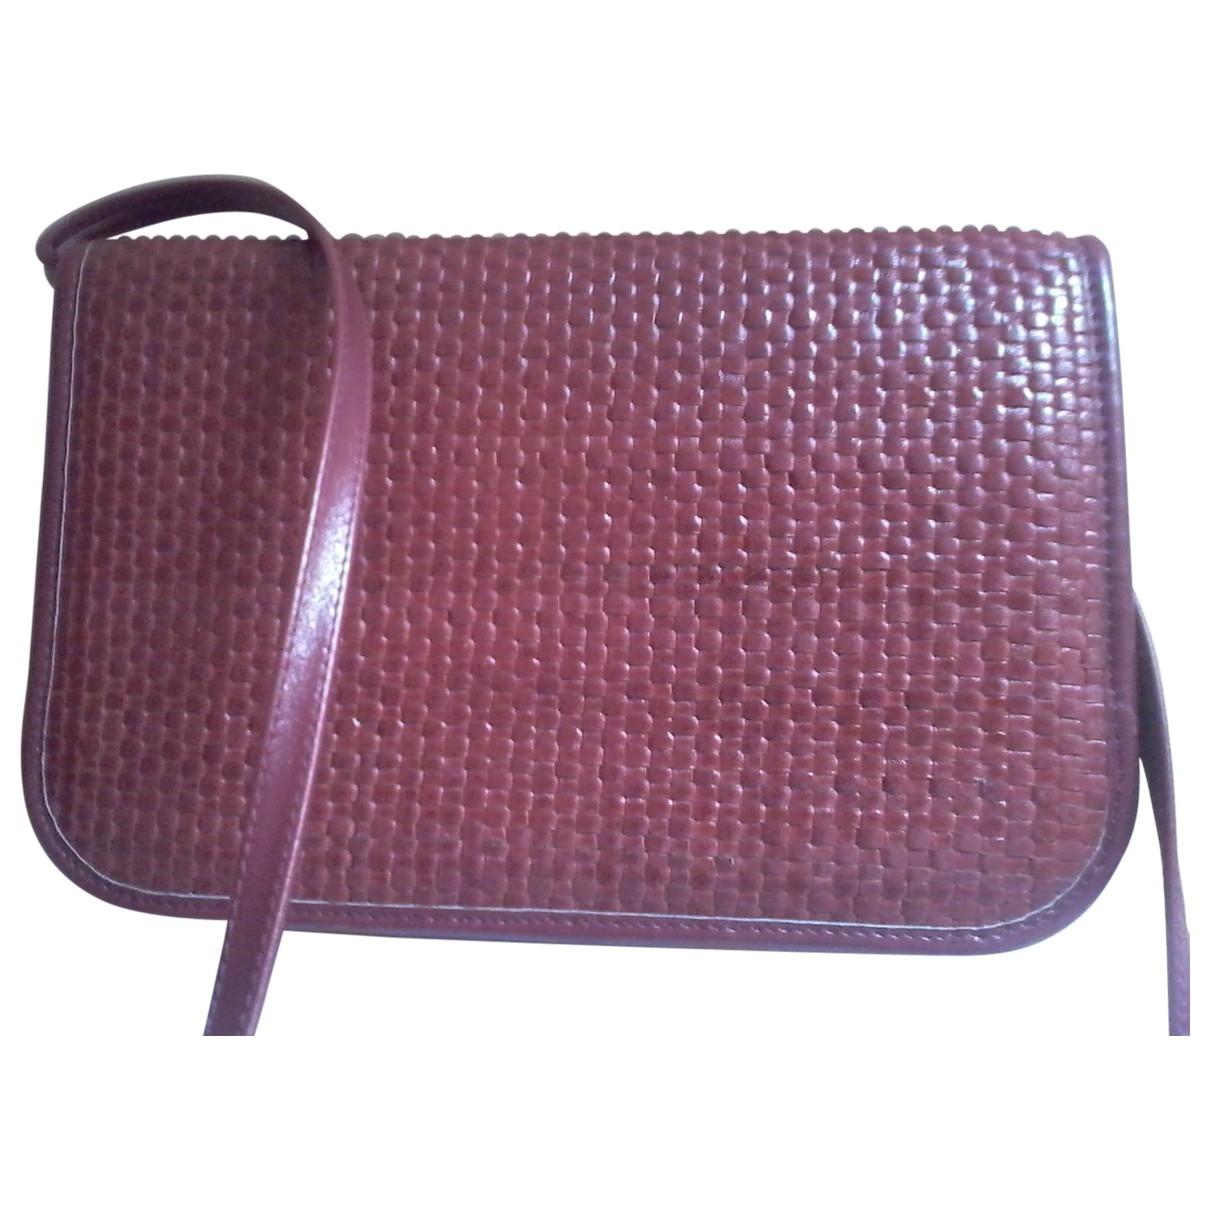 Bally \N Handtasche in  Bordeauxrot Leder